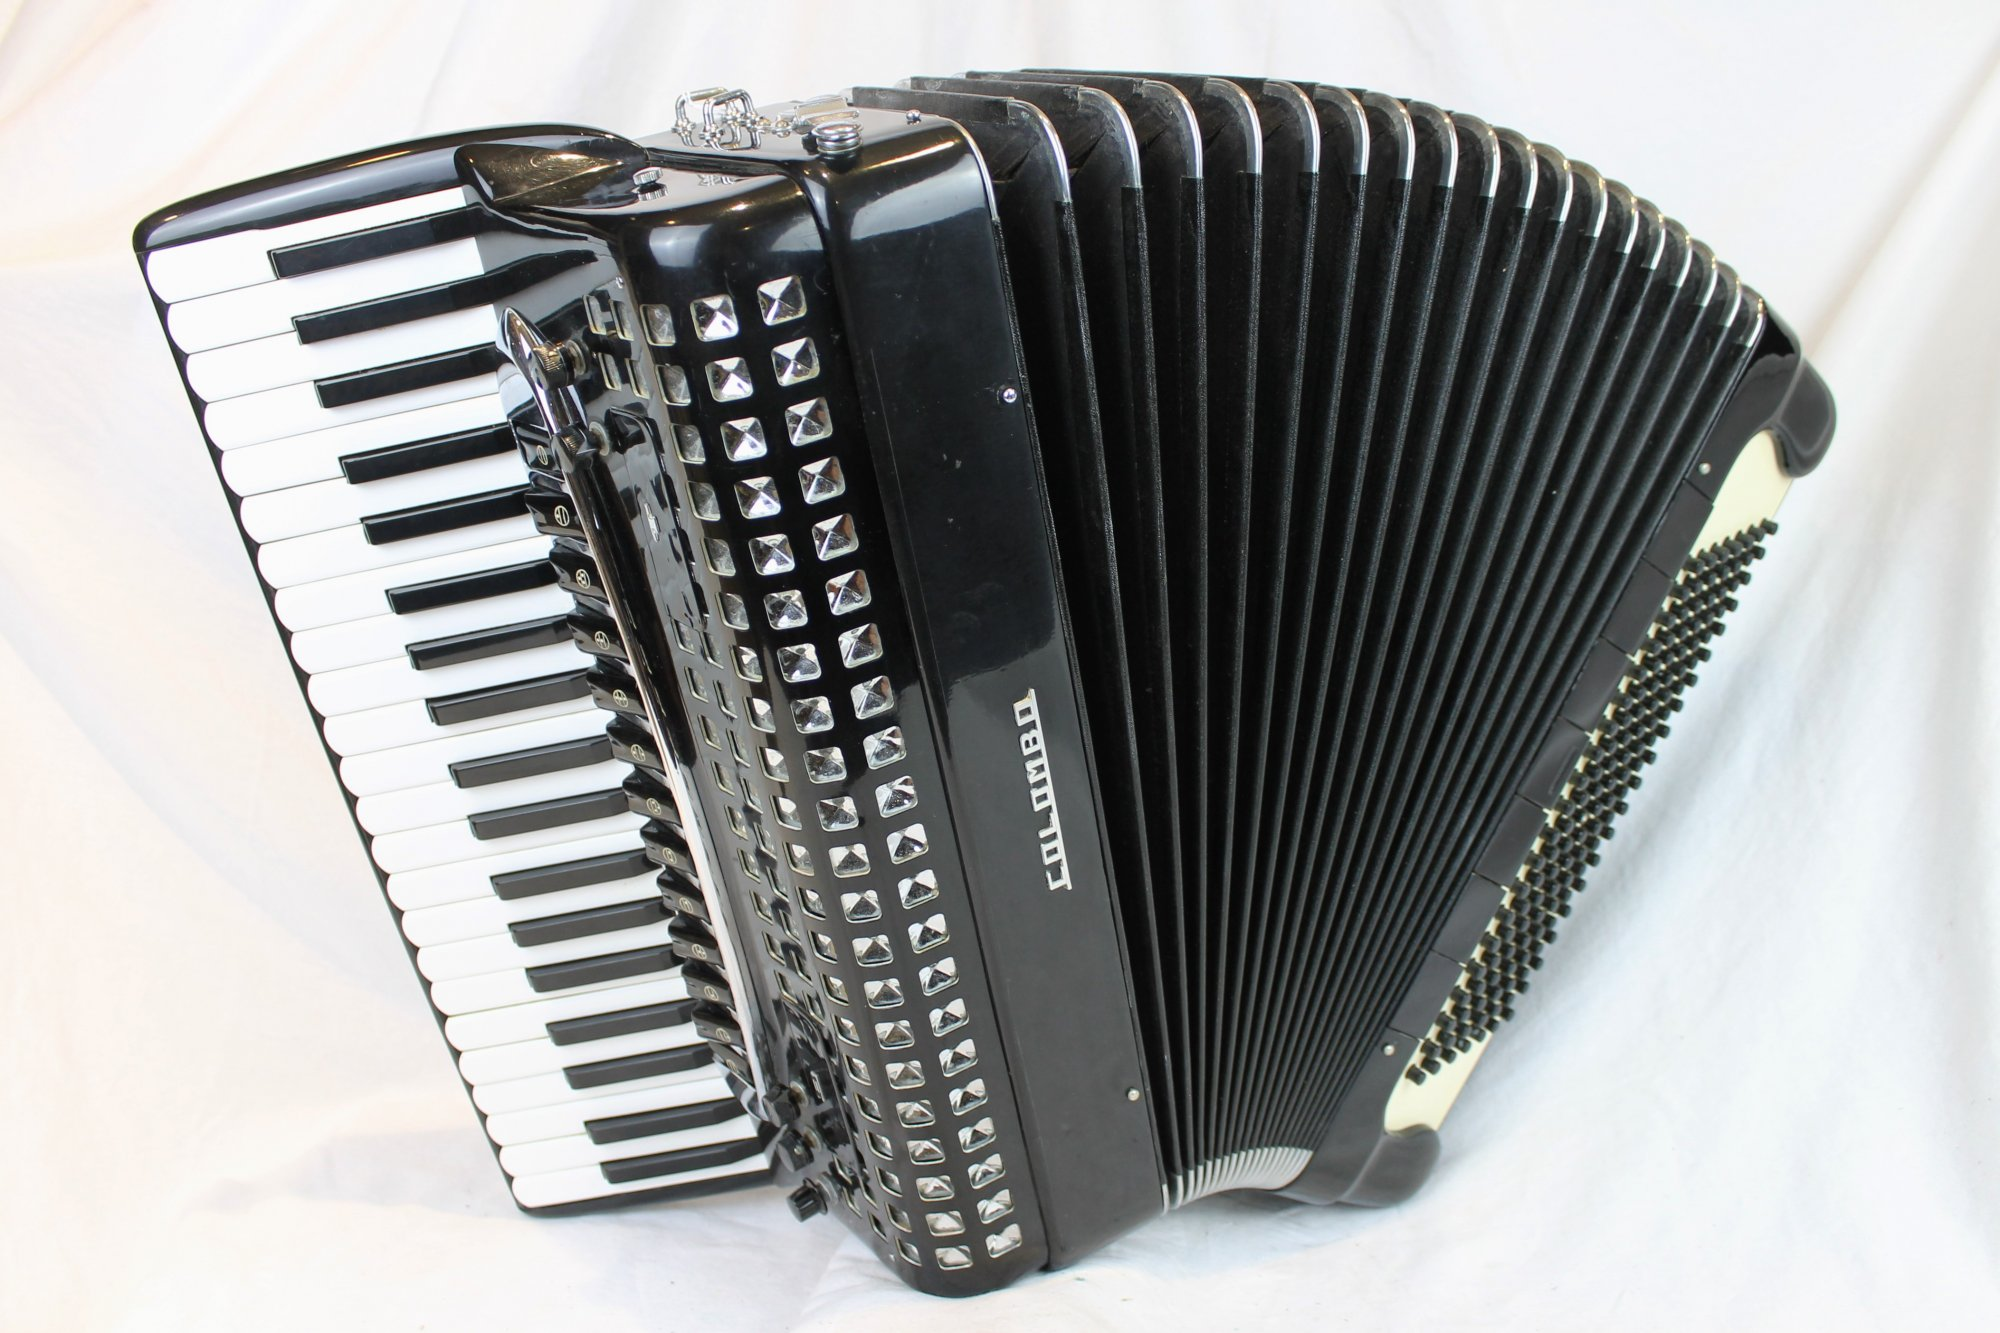 4221 - Black Colombo Piano Accordion LMMH 41 120